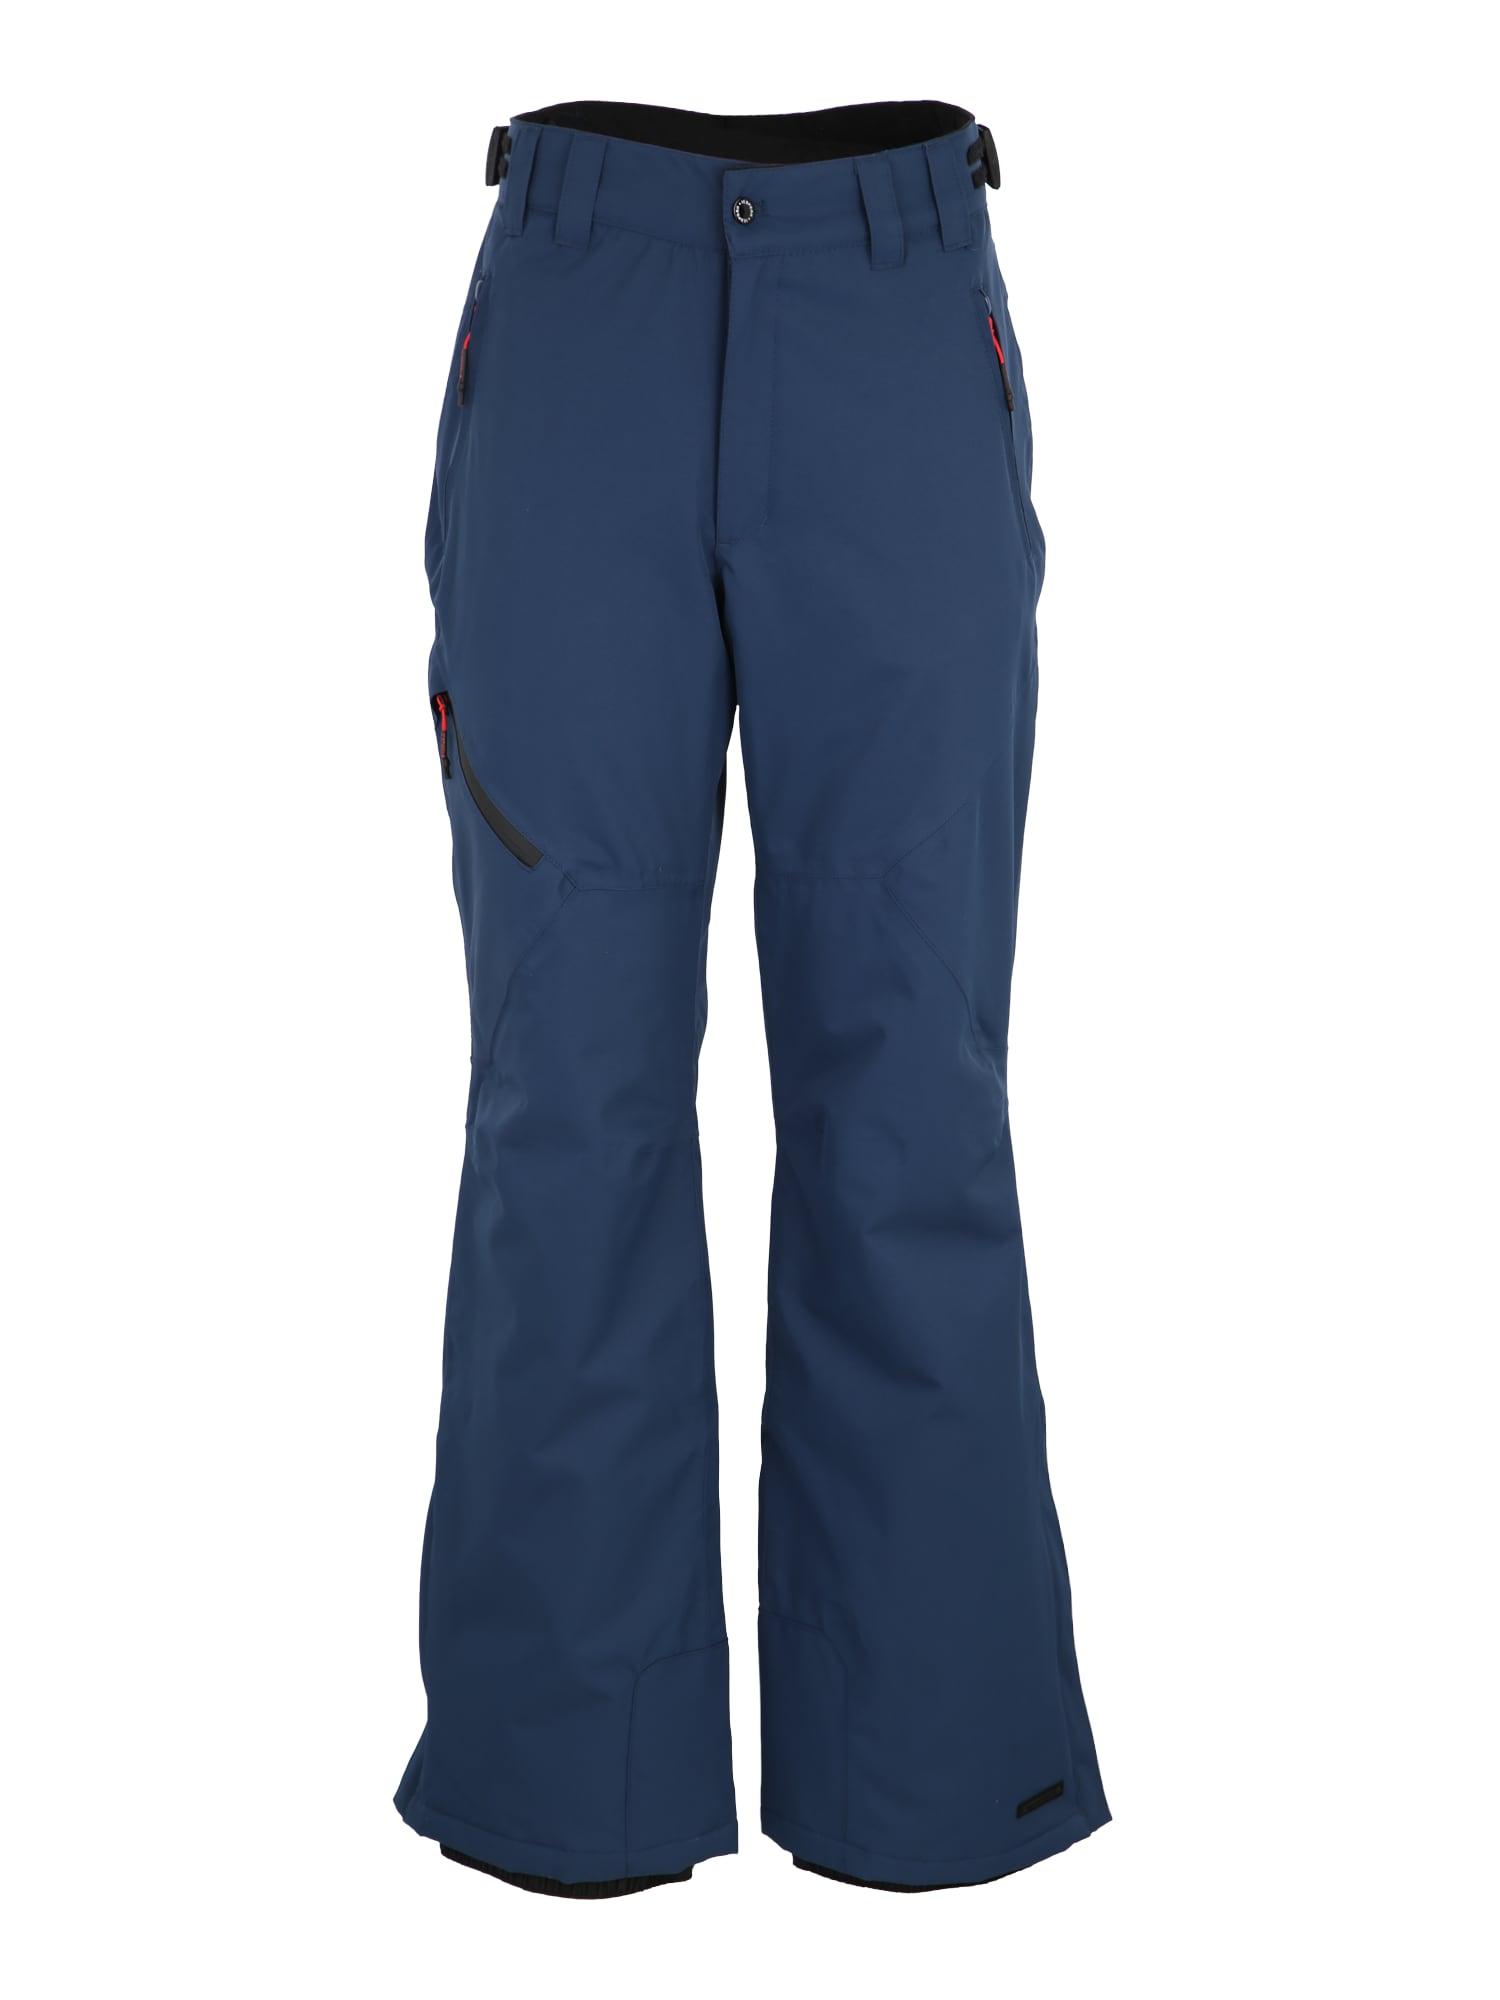 Outdoorové kalhoty Johny modrá ICEPEAK